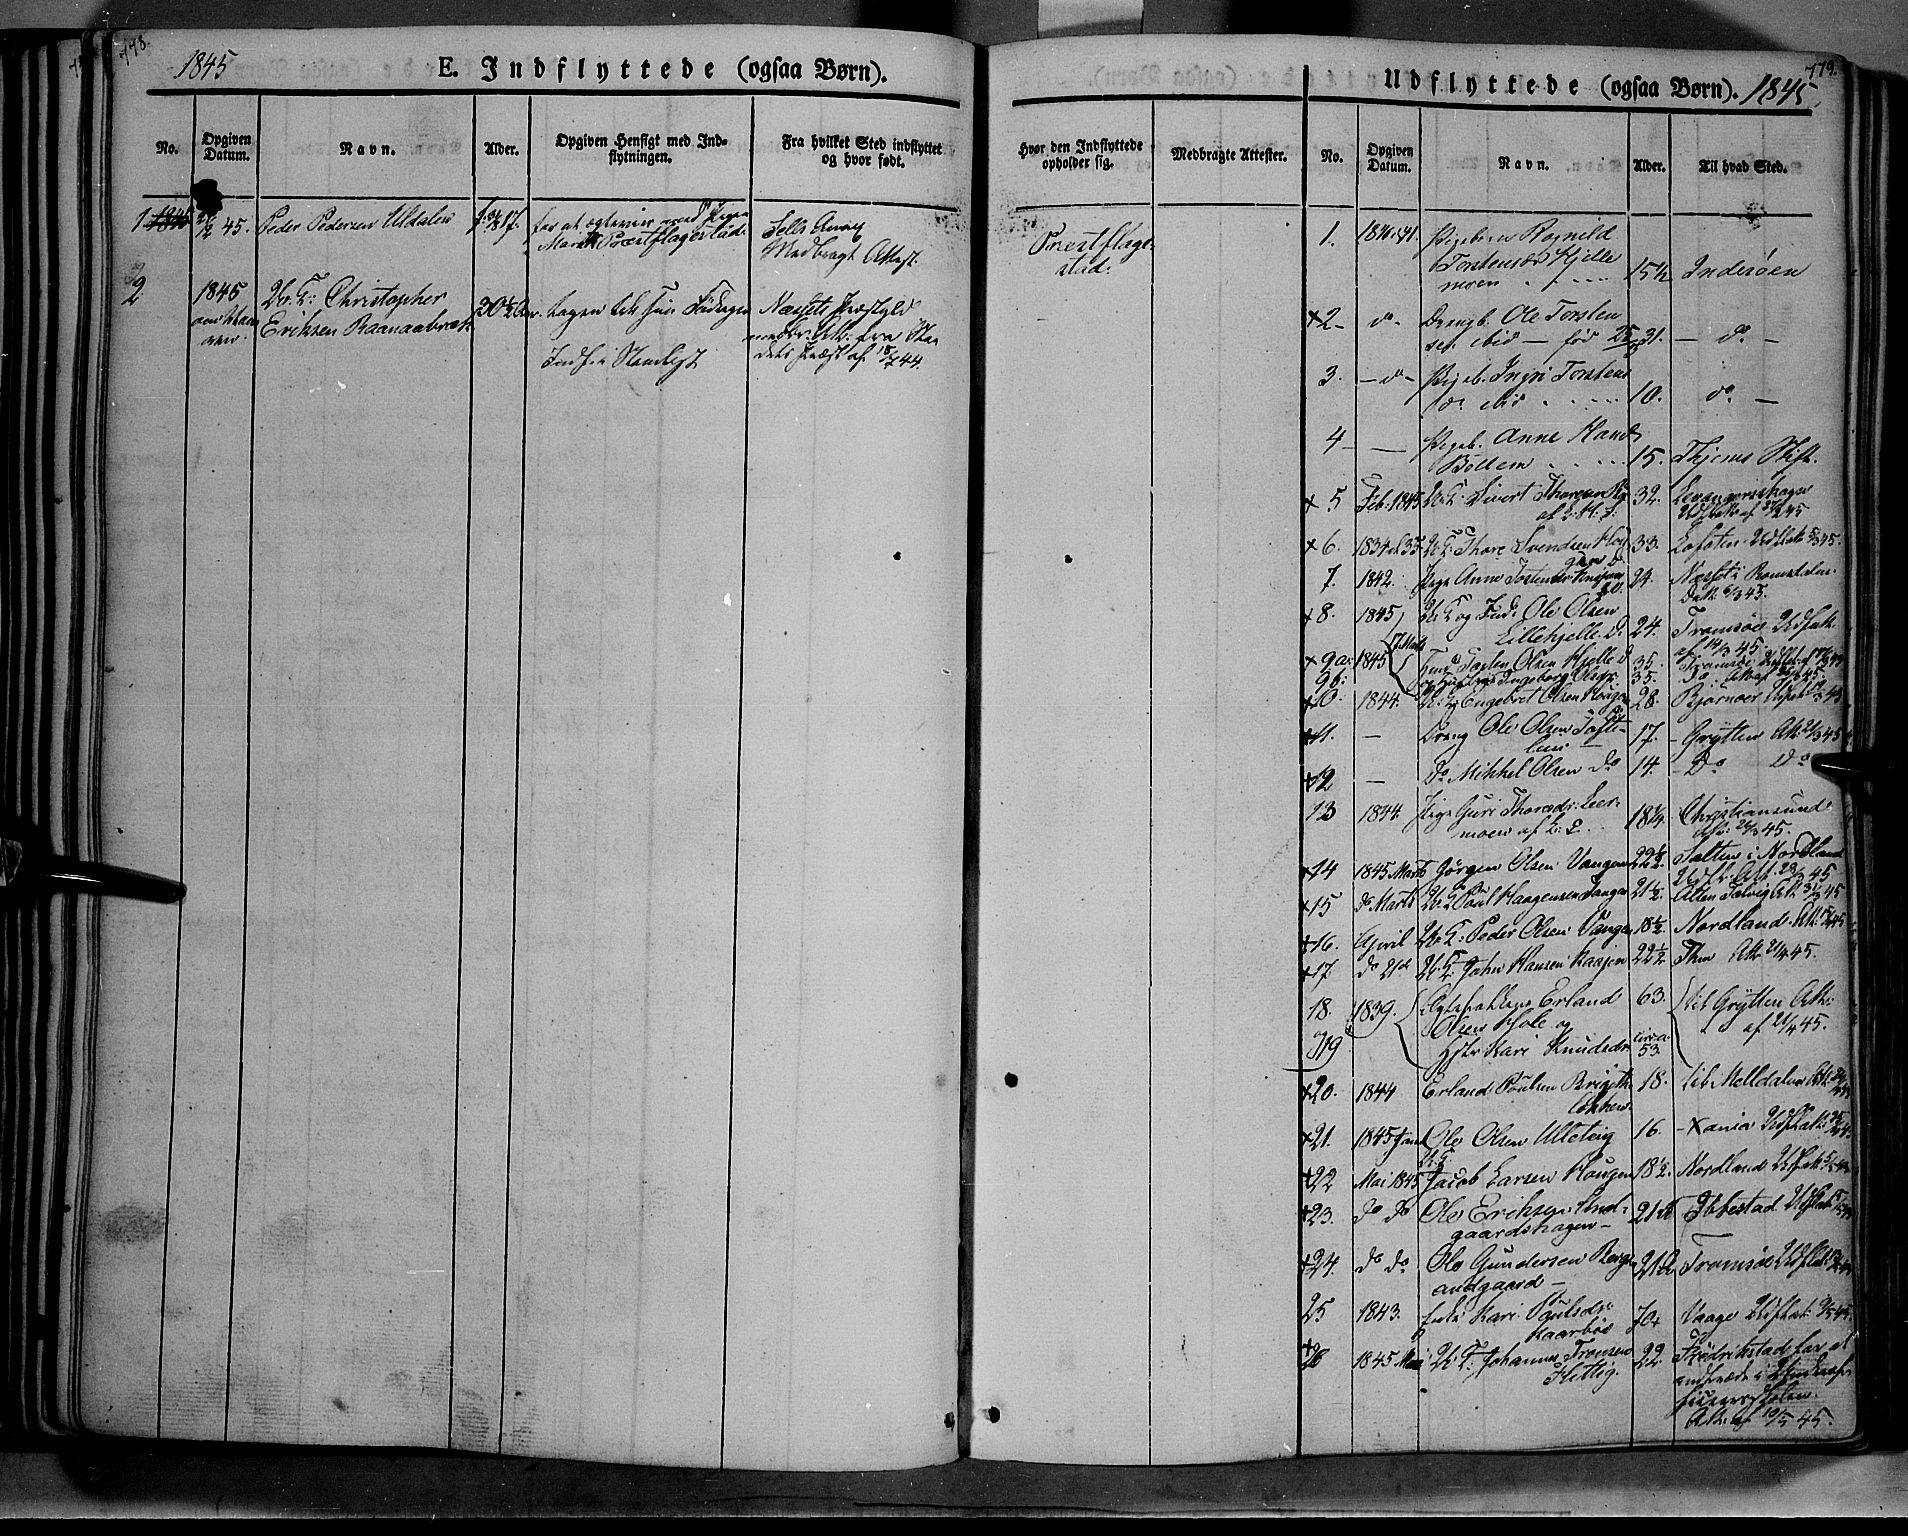 SAH, Lesja prestekontor, Ministerialbok nr. 6B, 1843-1854, s. 778-779